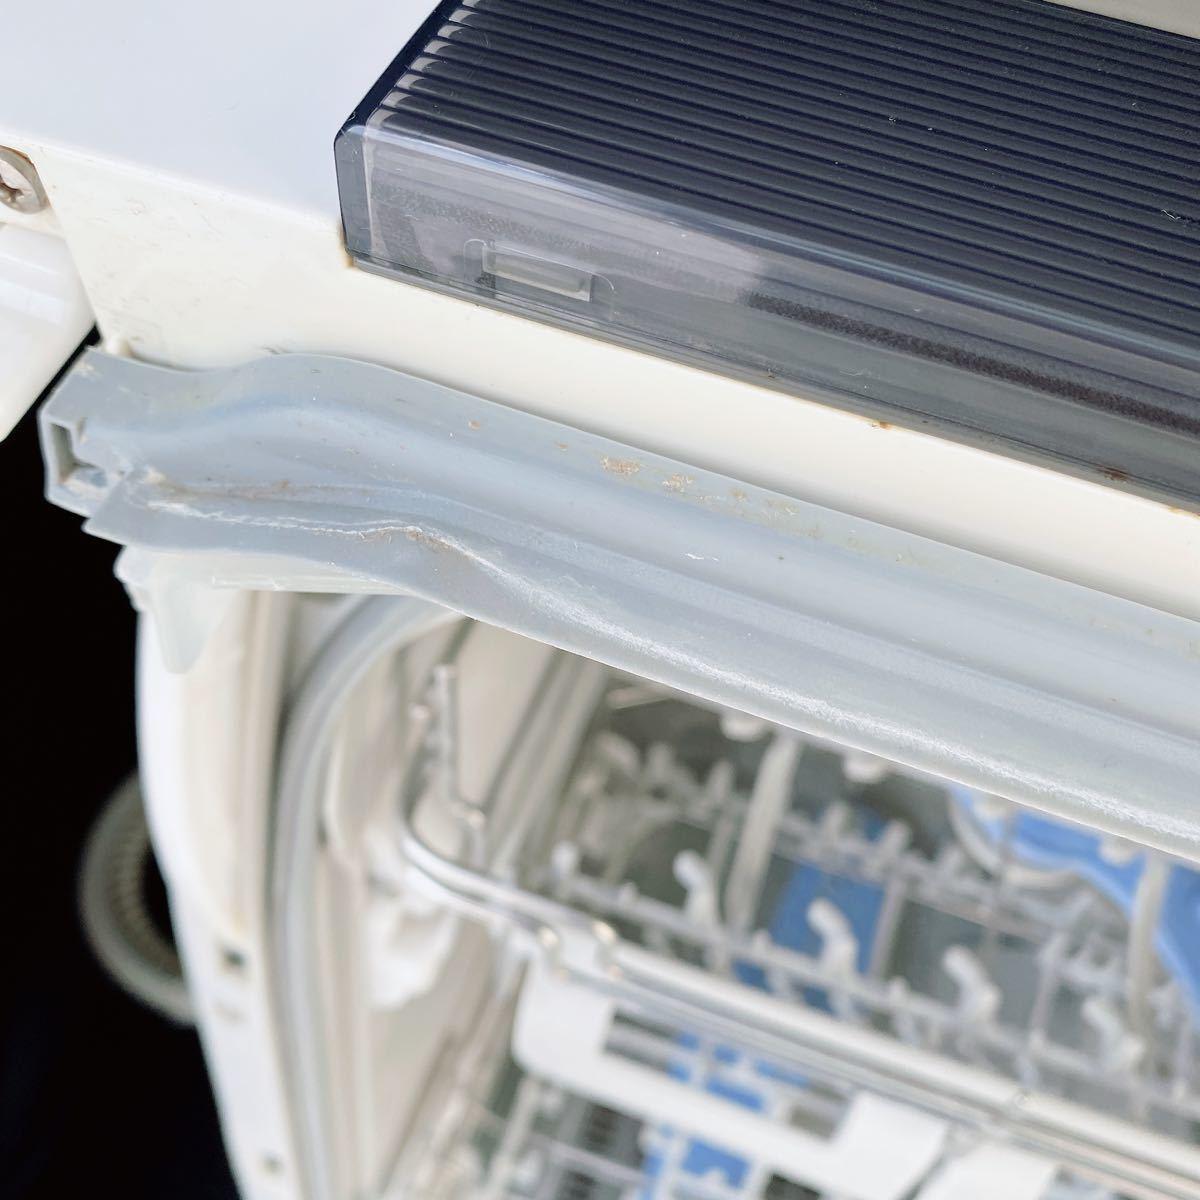 Panasonic パナソニック 食器洗い乾燥機 NP-TR5 12年製